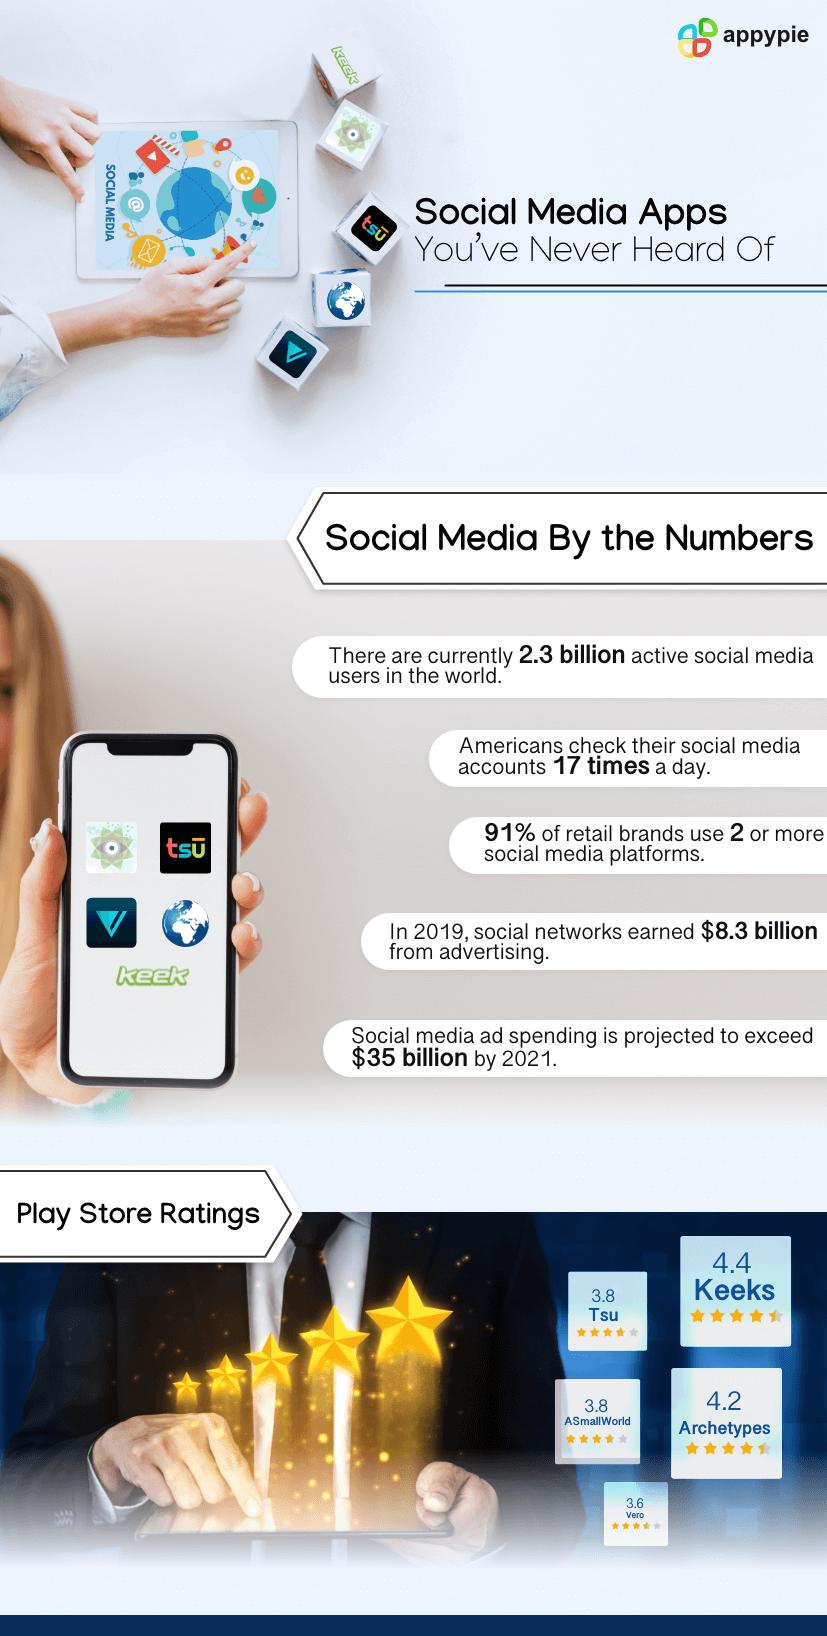 Social Media App - Appy Pie